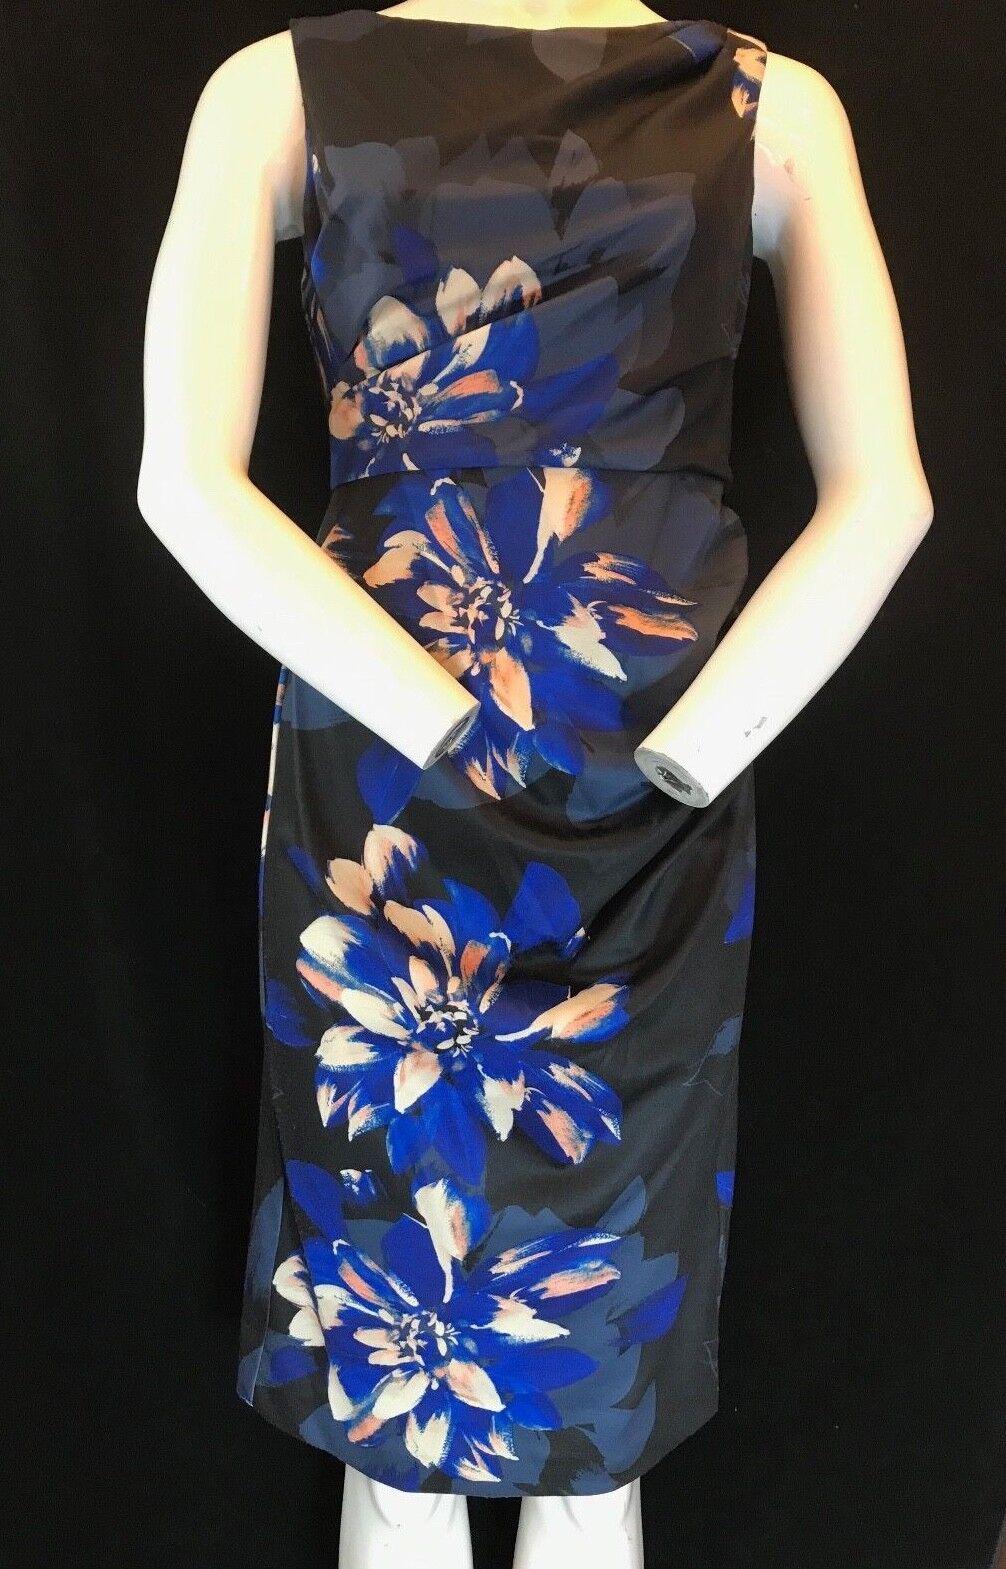 BNWT damen KARAN New York Knee Length Sleeveless Floral Print Dress Größe